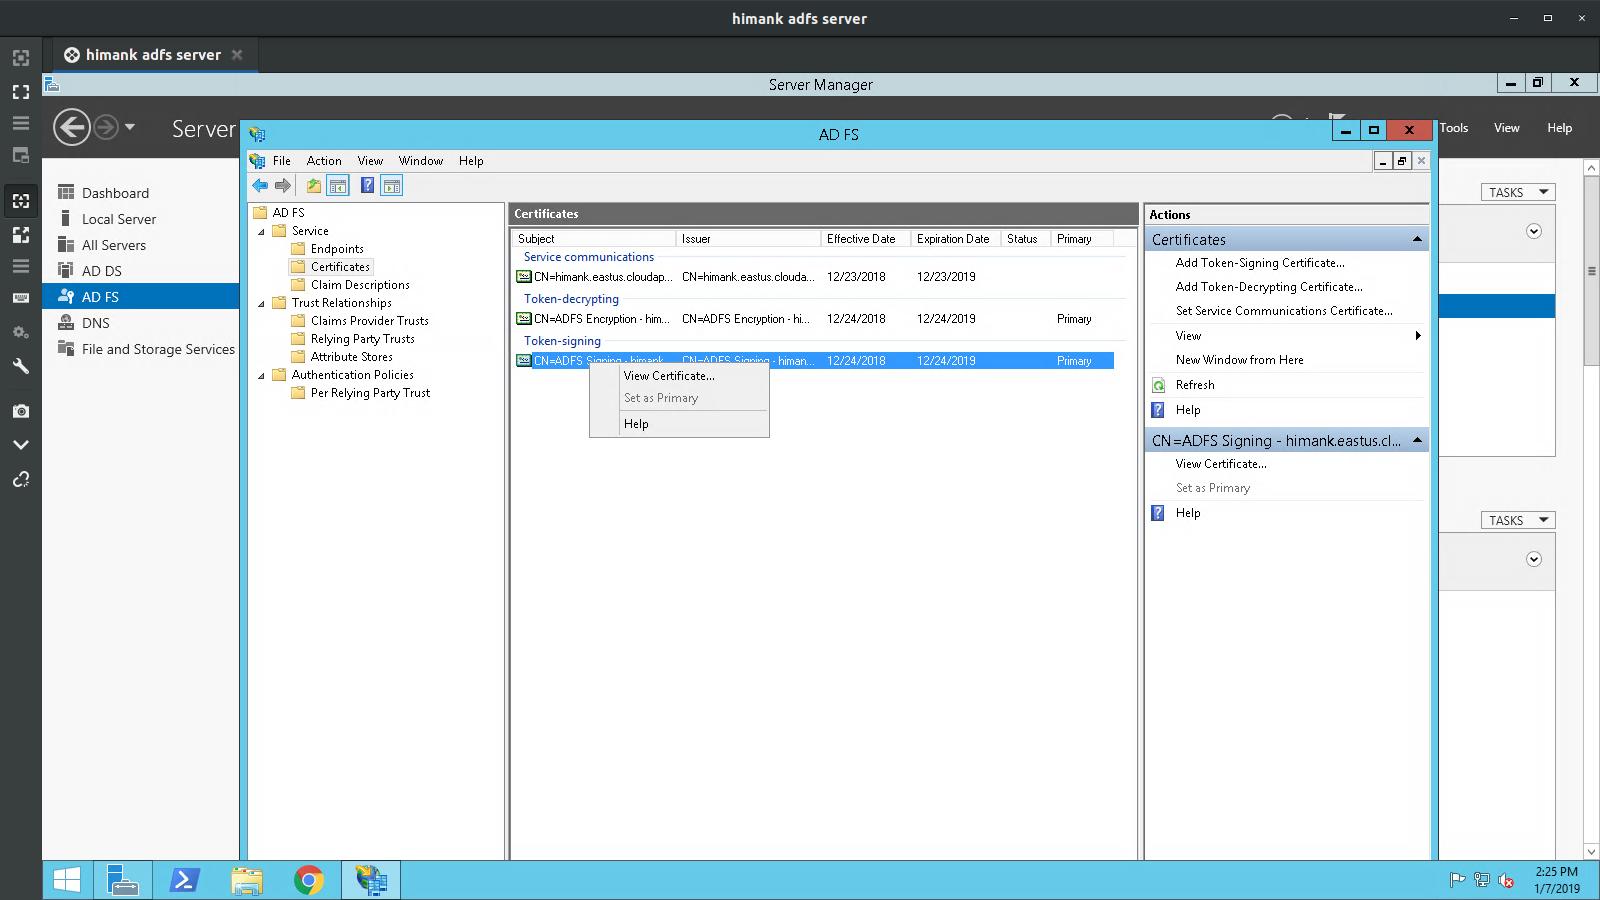 Help Center - Microsoft ADFS